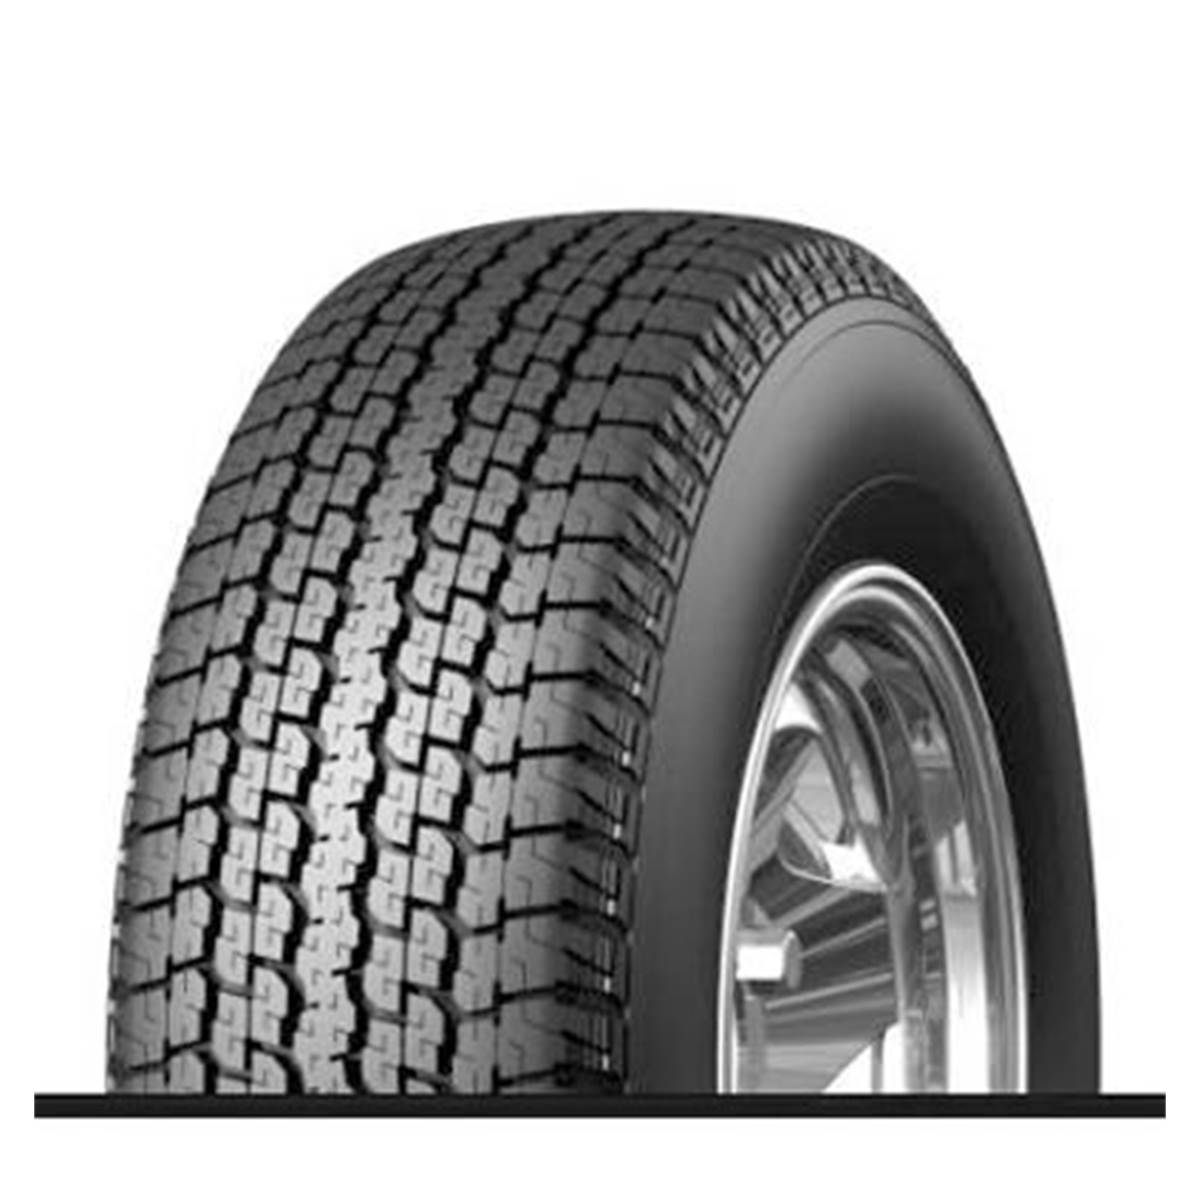 Pneu Bridgestone 265/60X18 109 H DUELER D840